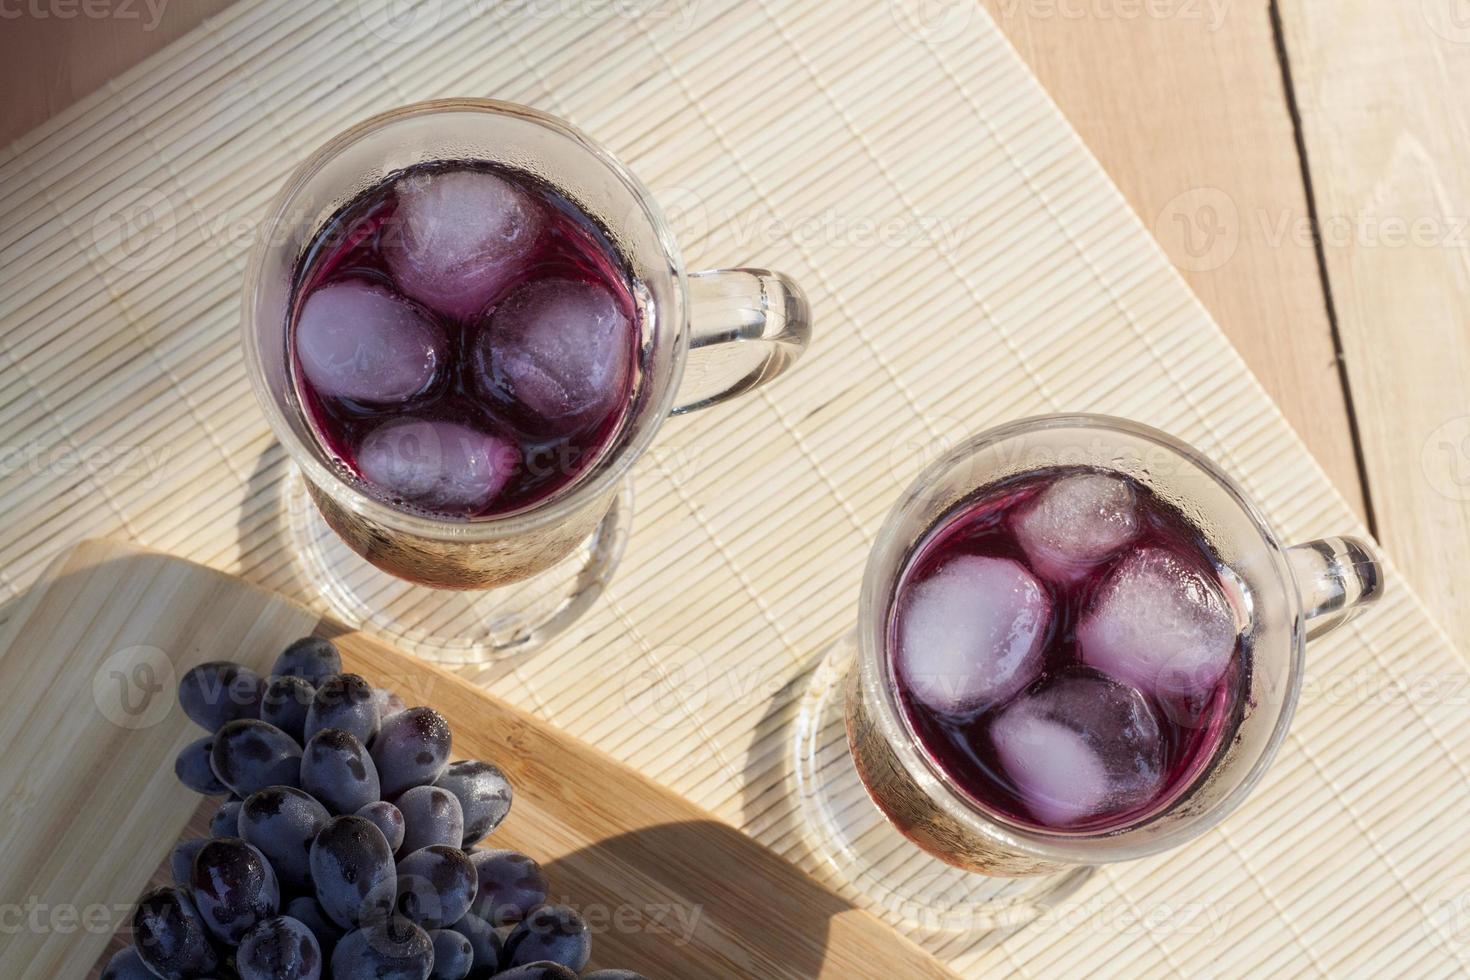 succo d'uva e uva blu fresca foto